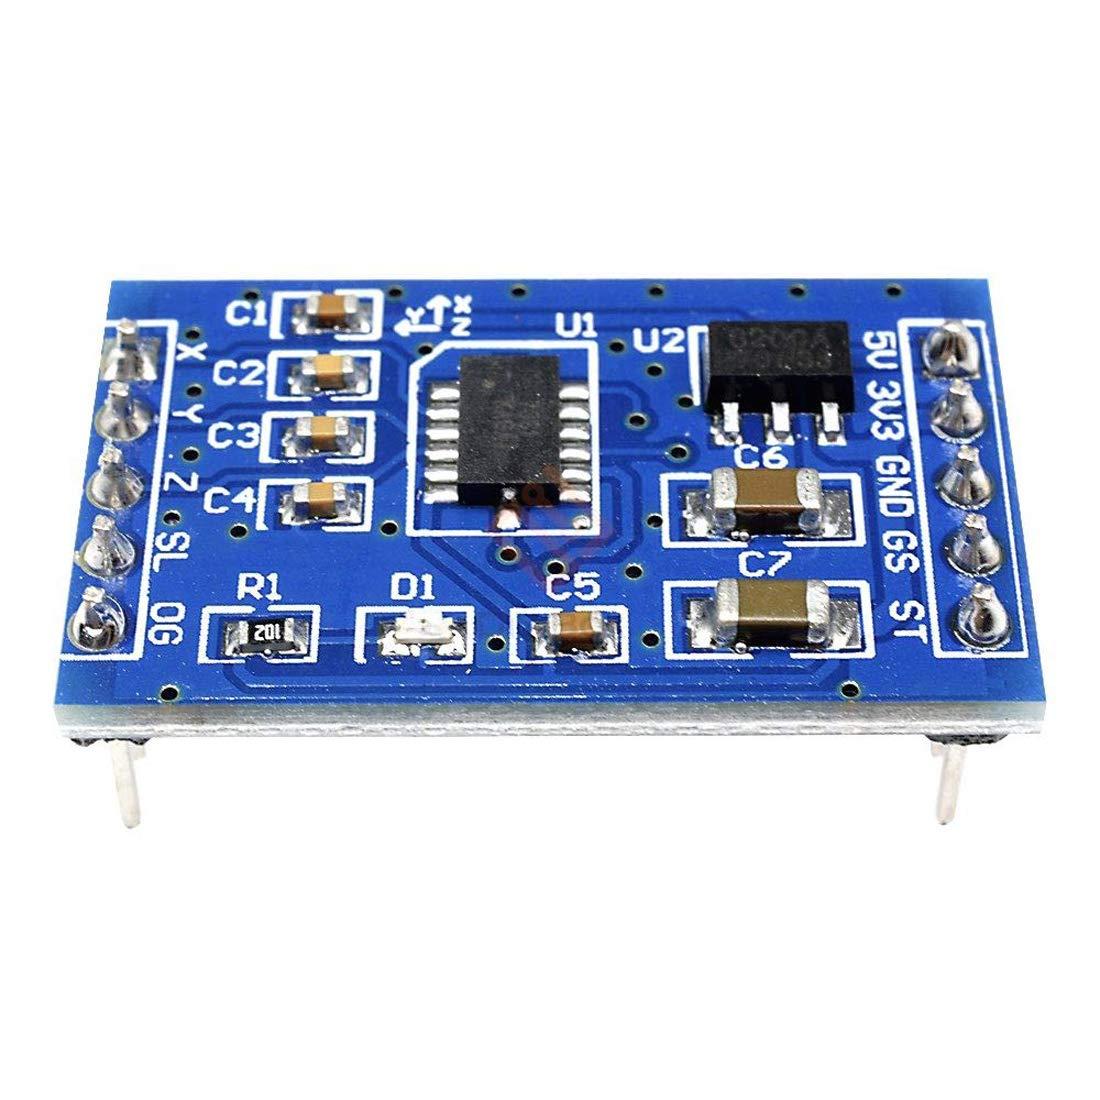 Hailege MMA7361 Triple Axis Accelerometer Acceleration Sensor Module for Arduino